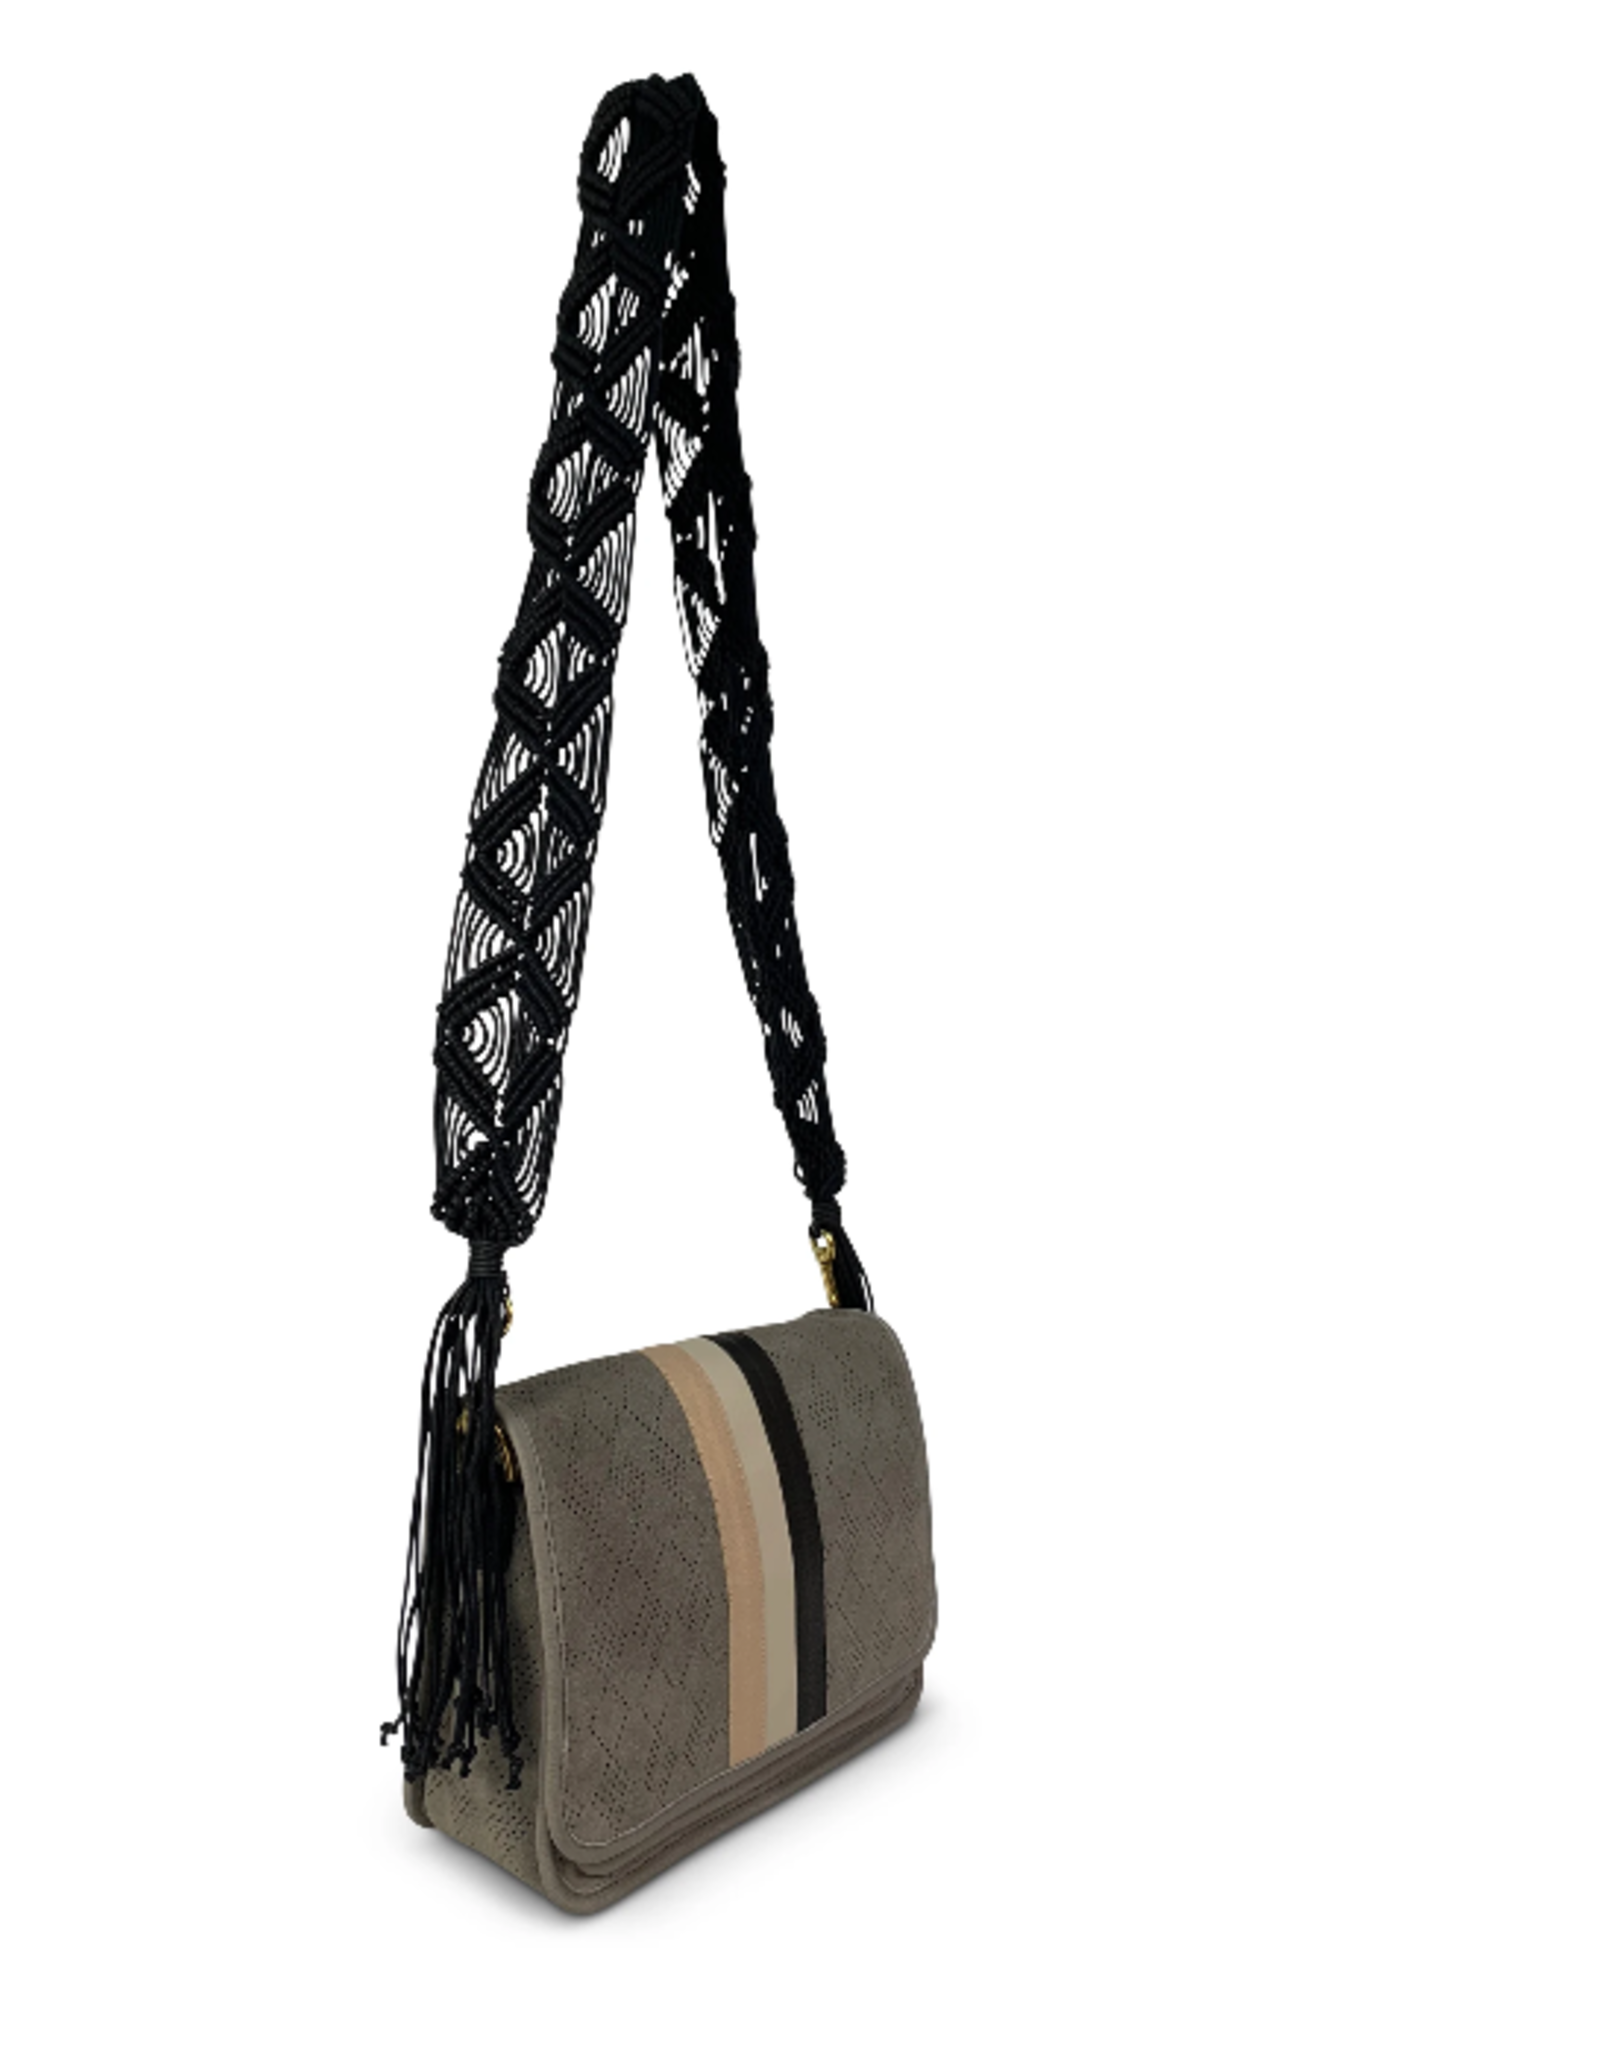 KEMPTON EVA SUEDE DIAMOND PERFORATED BAG